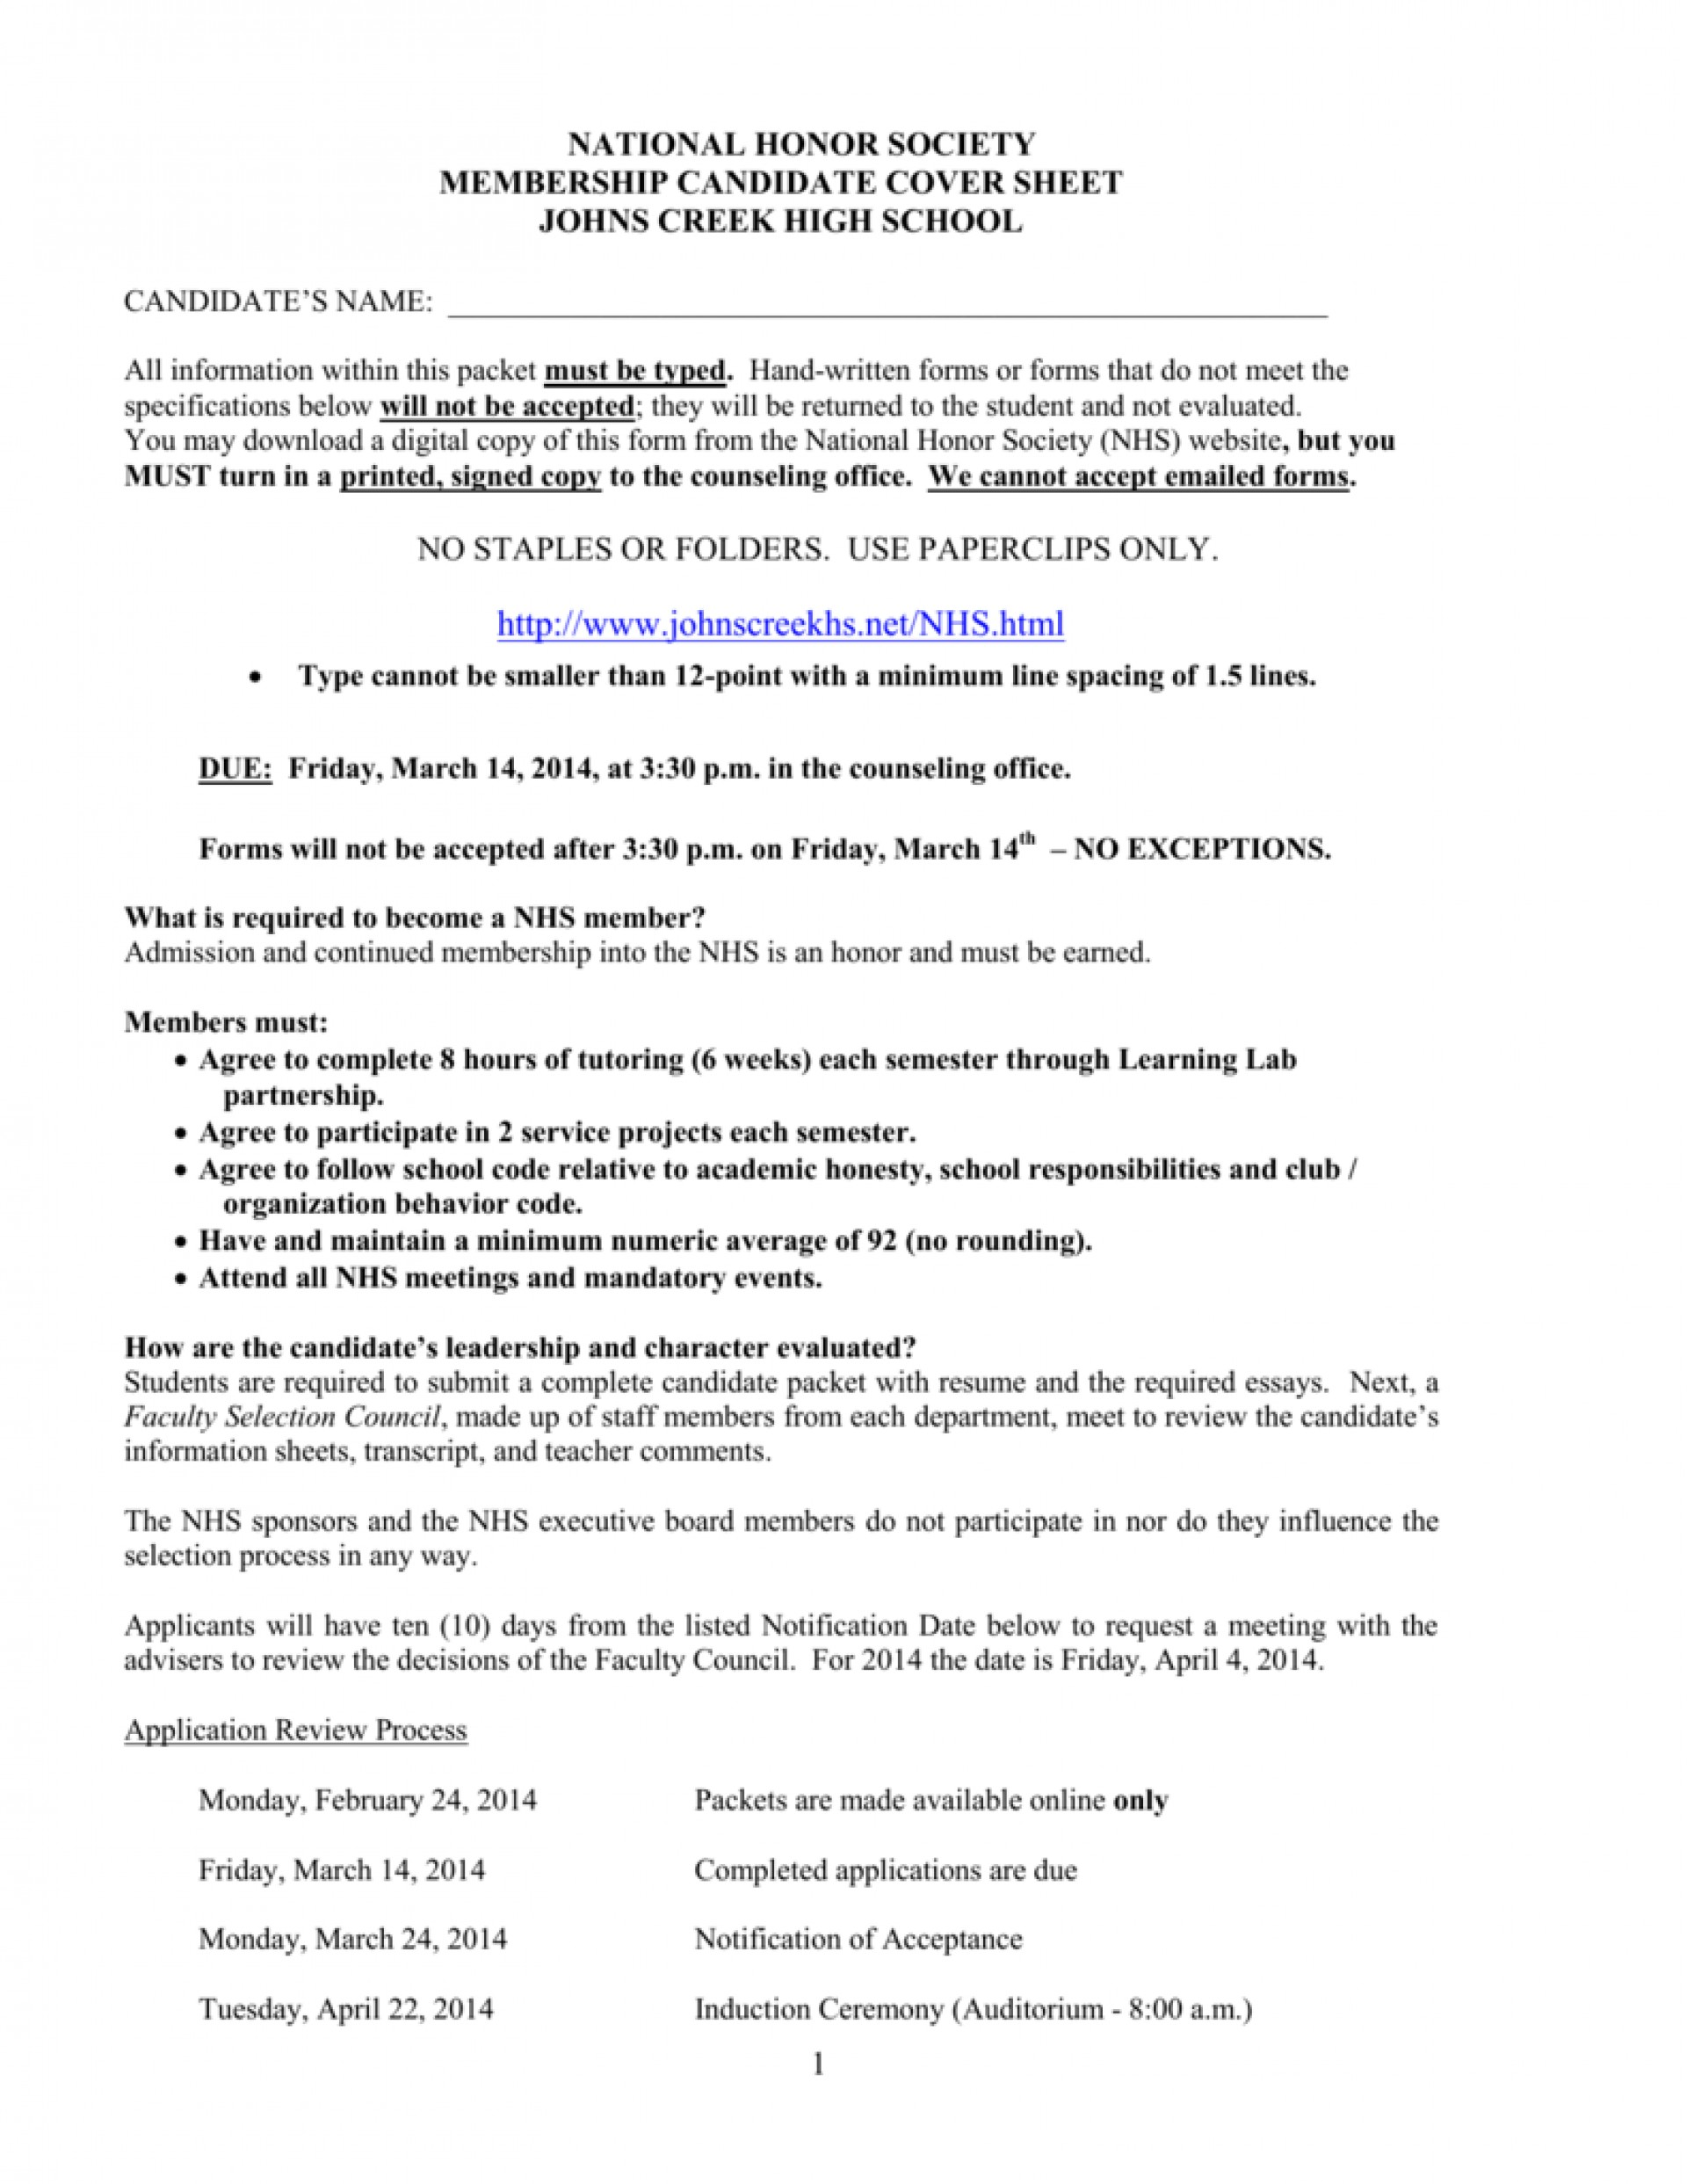 015 National Honor Society Application Essay 008823851 1 Sensational Junior Ideas Examples 1920